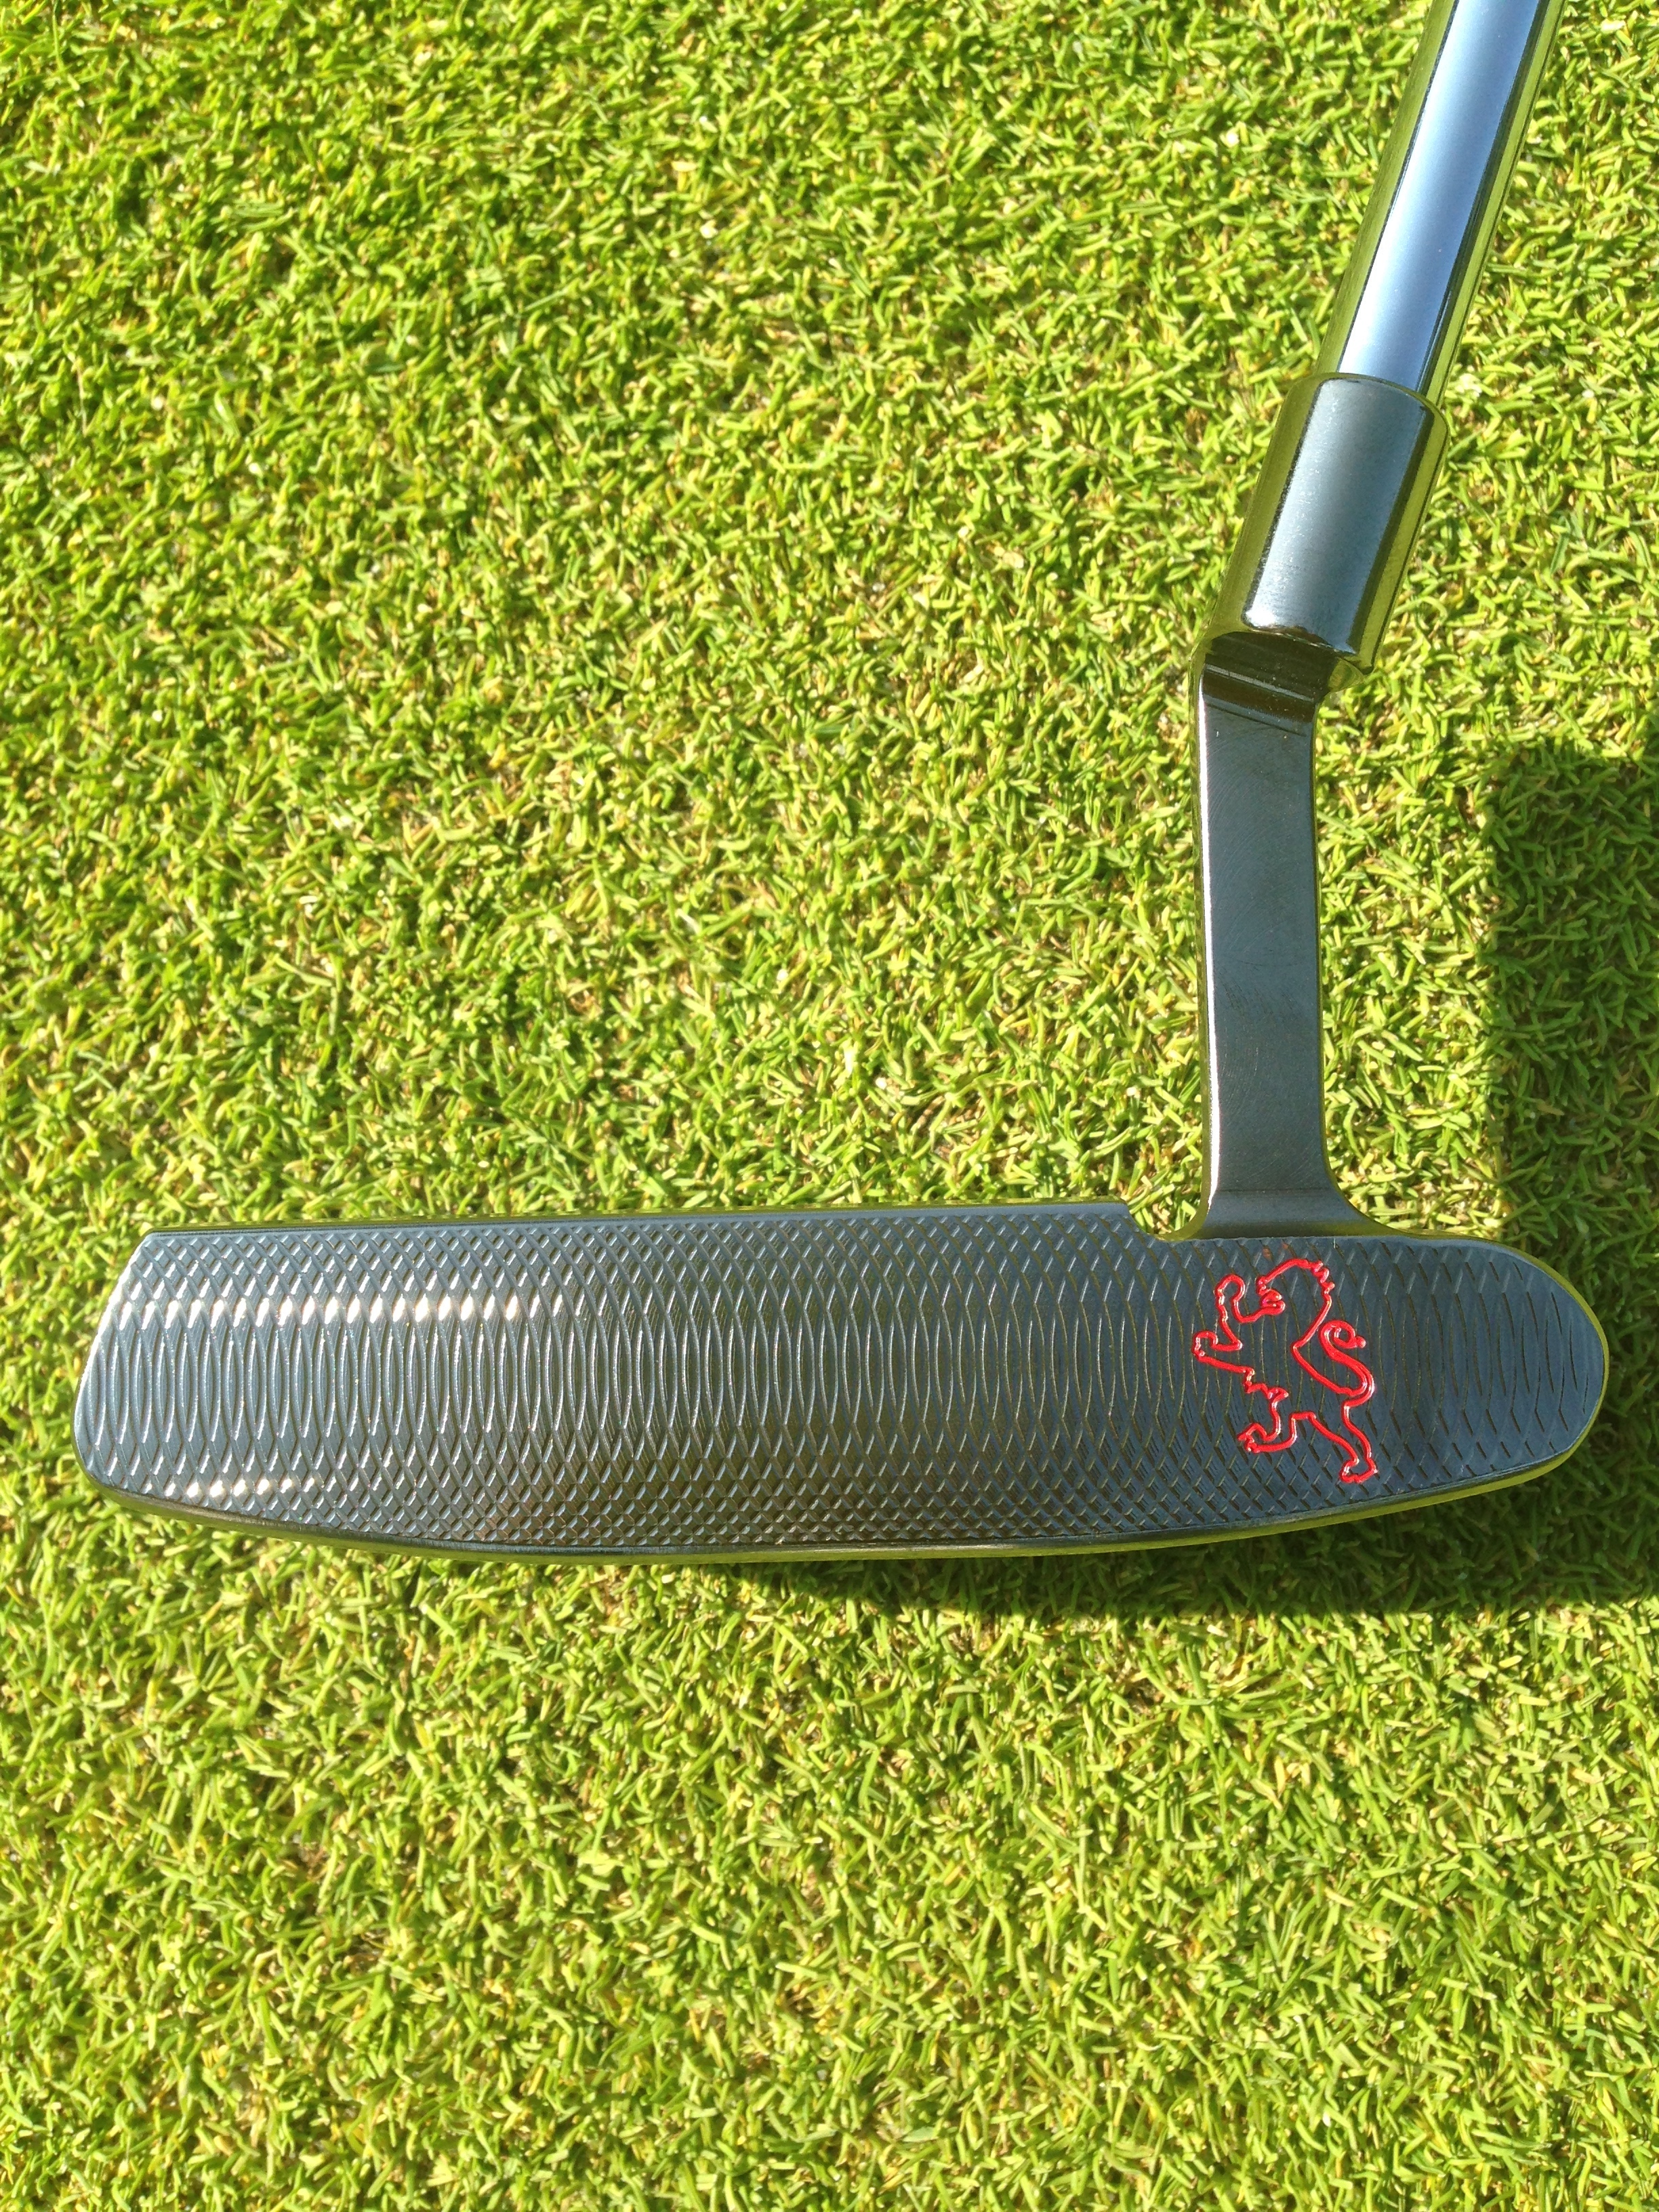 piretti golf putter review golf by josh hirst pga professional